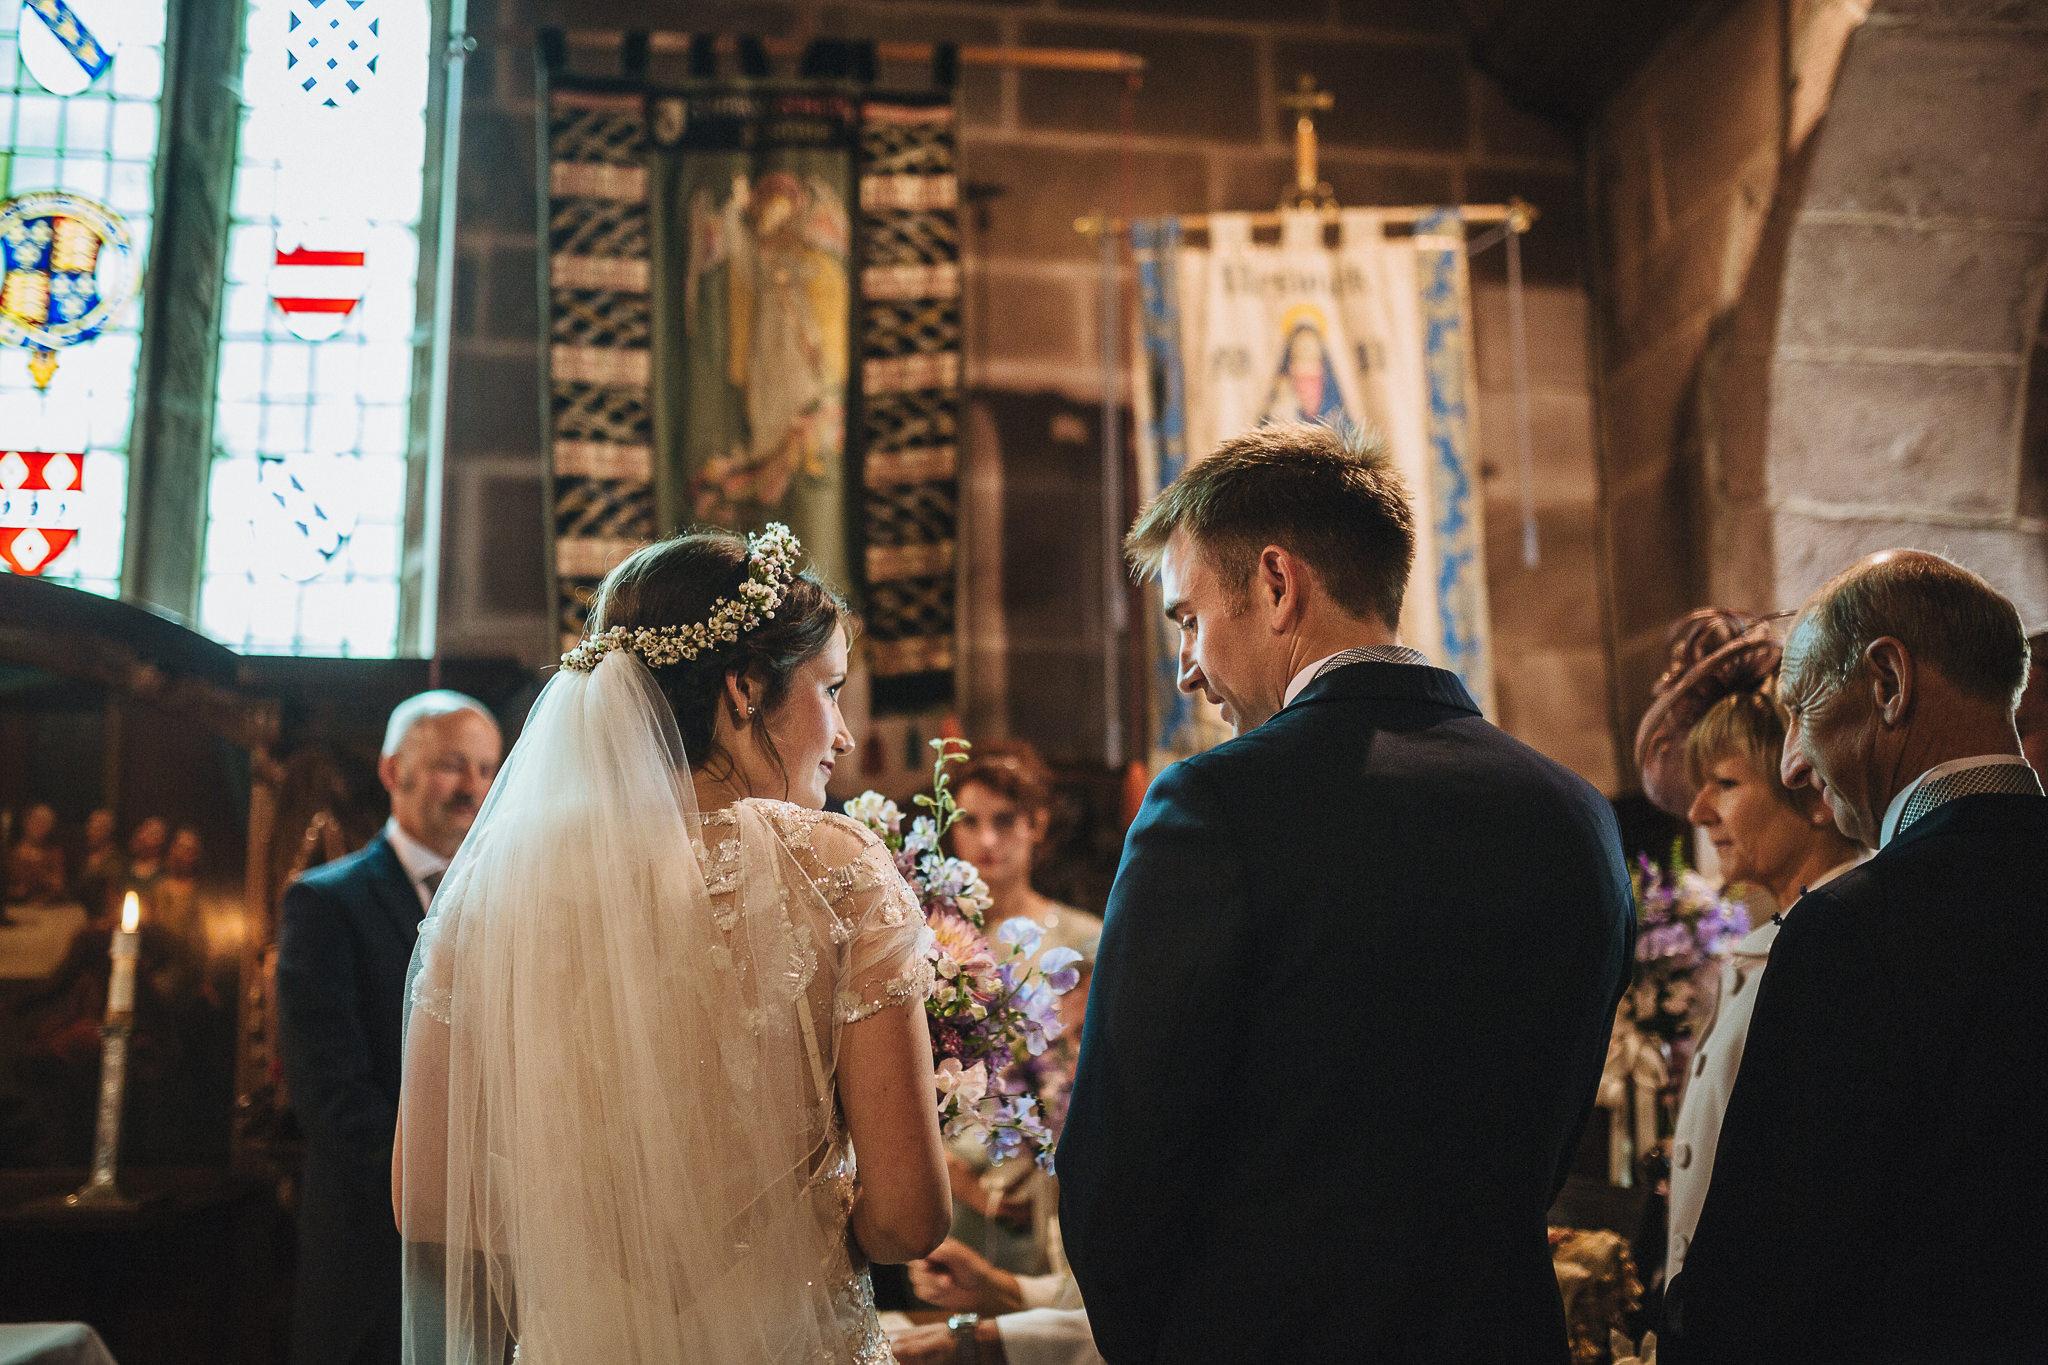 paul-marbrook-Farm-Wedding-Photographer-Lancashire-90031